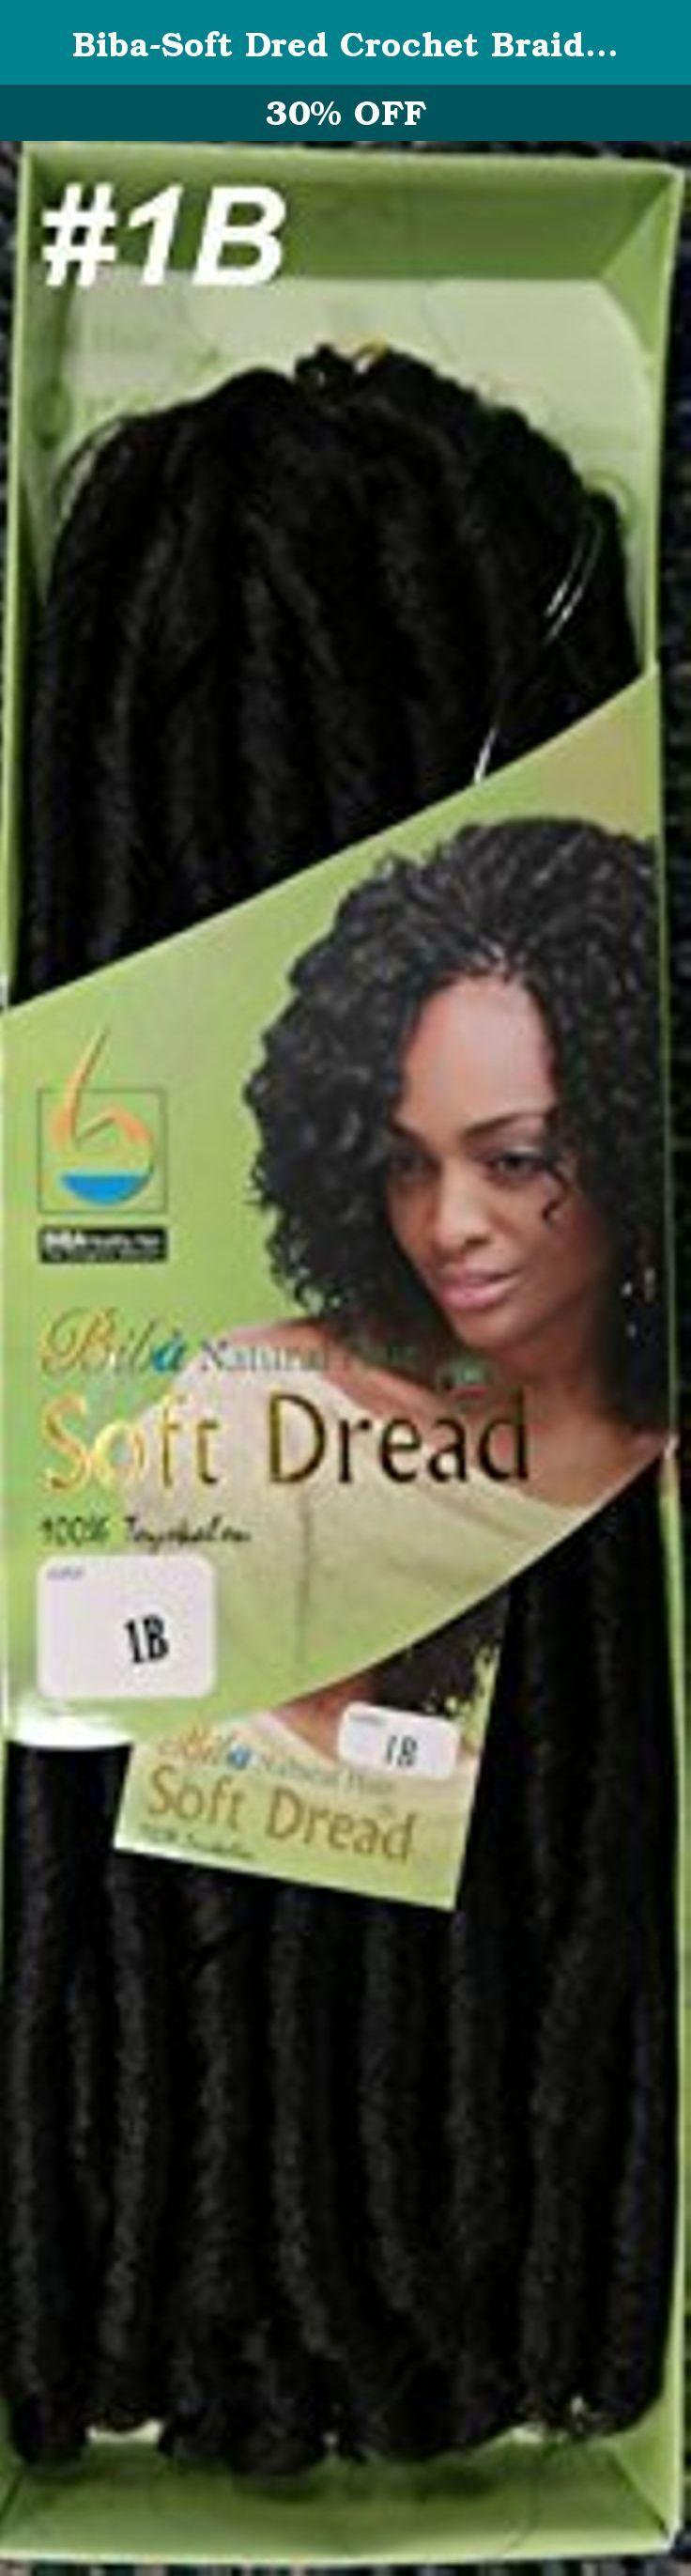 Biba-Soft Dred Crochet Braid-Natural Crochet Hair Braid-[2PACKS DEAL](1B) by Biba. Biba Soft Dread Crochet Braid;2 Packs are Enough.;Natural Hair;100% Toyokalon;Brand New.